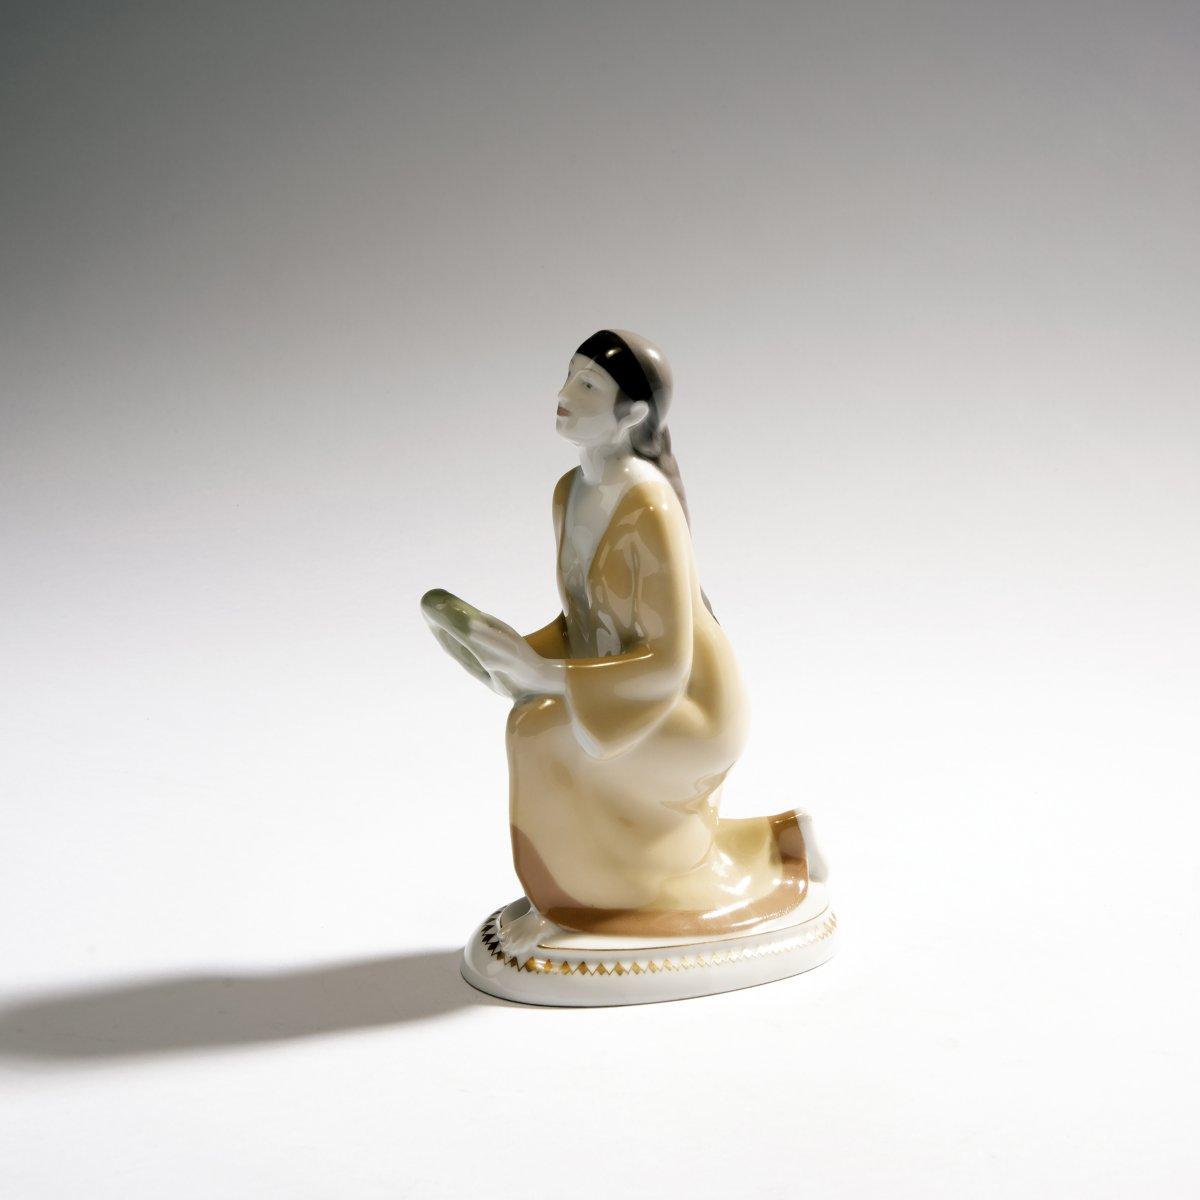 Lot 55 - Adolph Amberg, 'Kneeling Caucasian woman', 1910'Kneeling Caucasian woman', 1910H. 19.9 cm. Made by